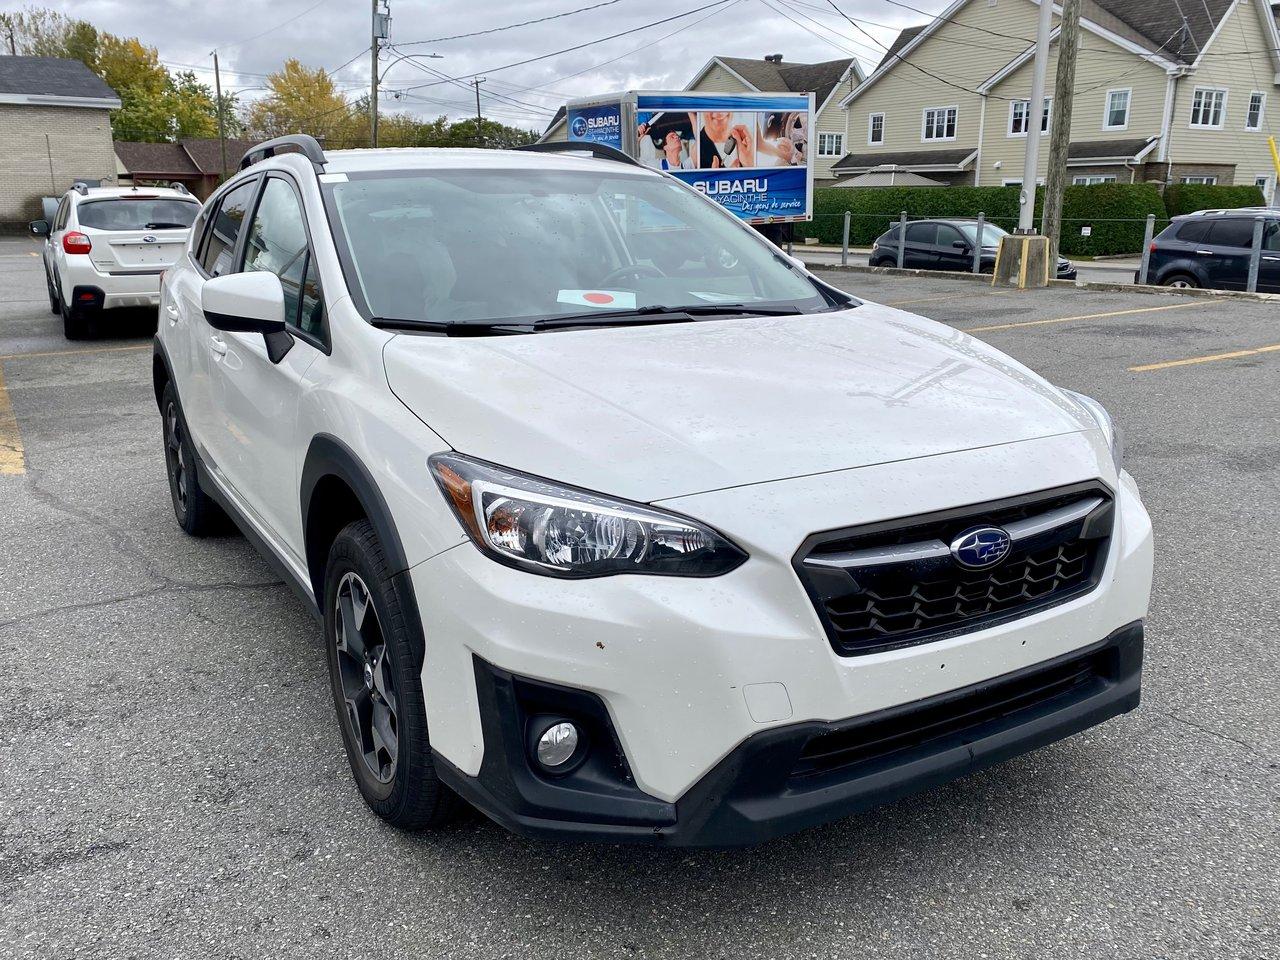 Subaru Crosstrek 2018 Touring, apple carplay, android auto, bluetoo